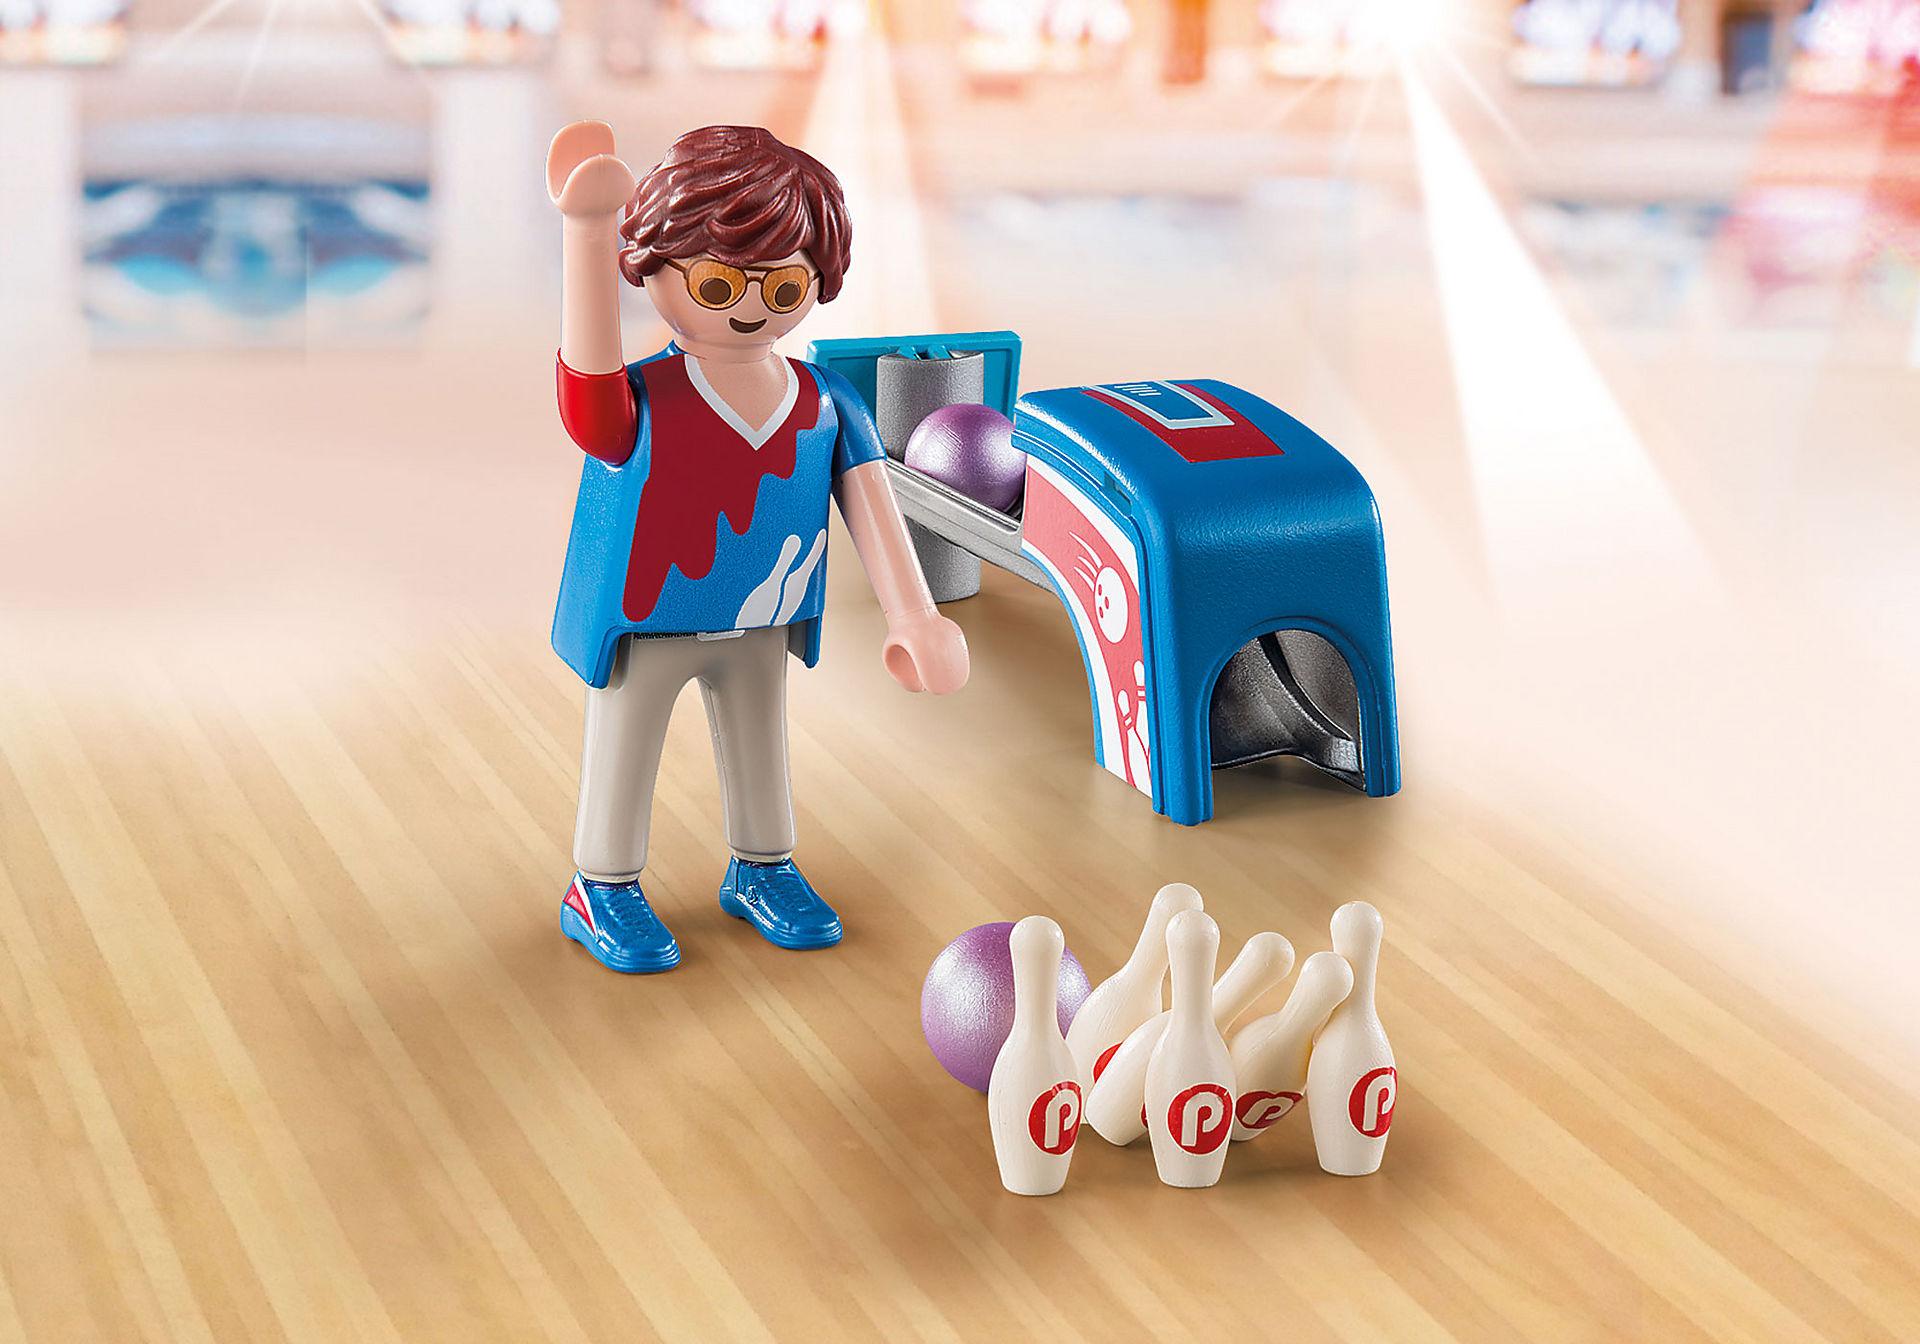 9440 Bowlingspeler zoom image1